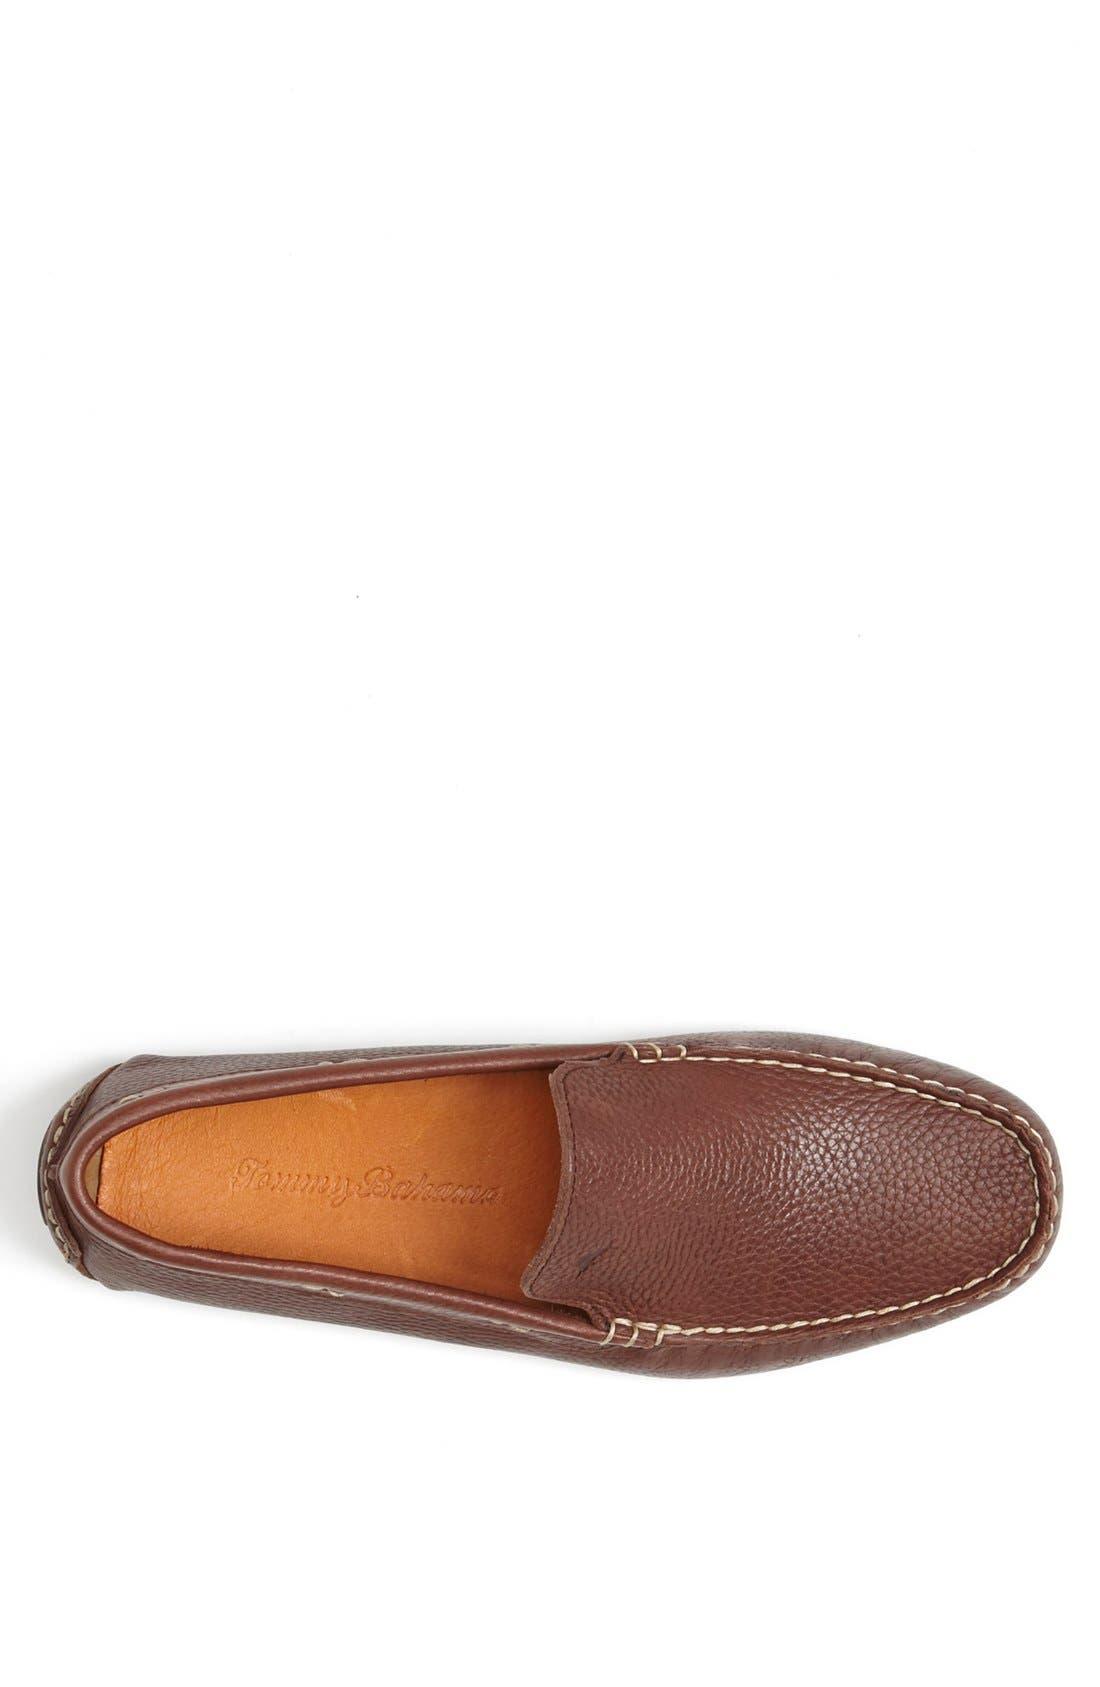 Alternate Image 3  - Tommy Bahama 'Pagota' Driving Shoe